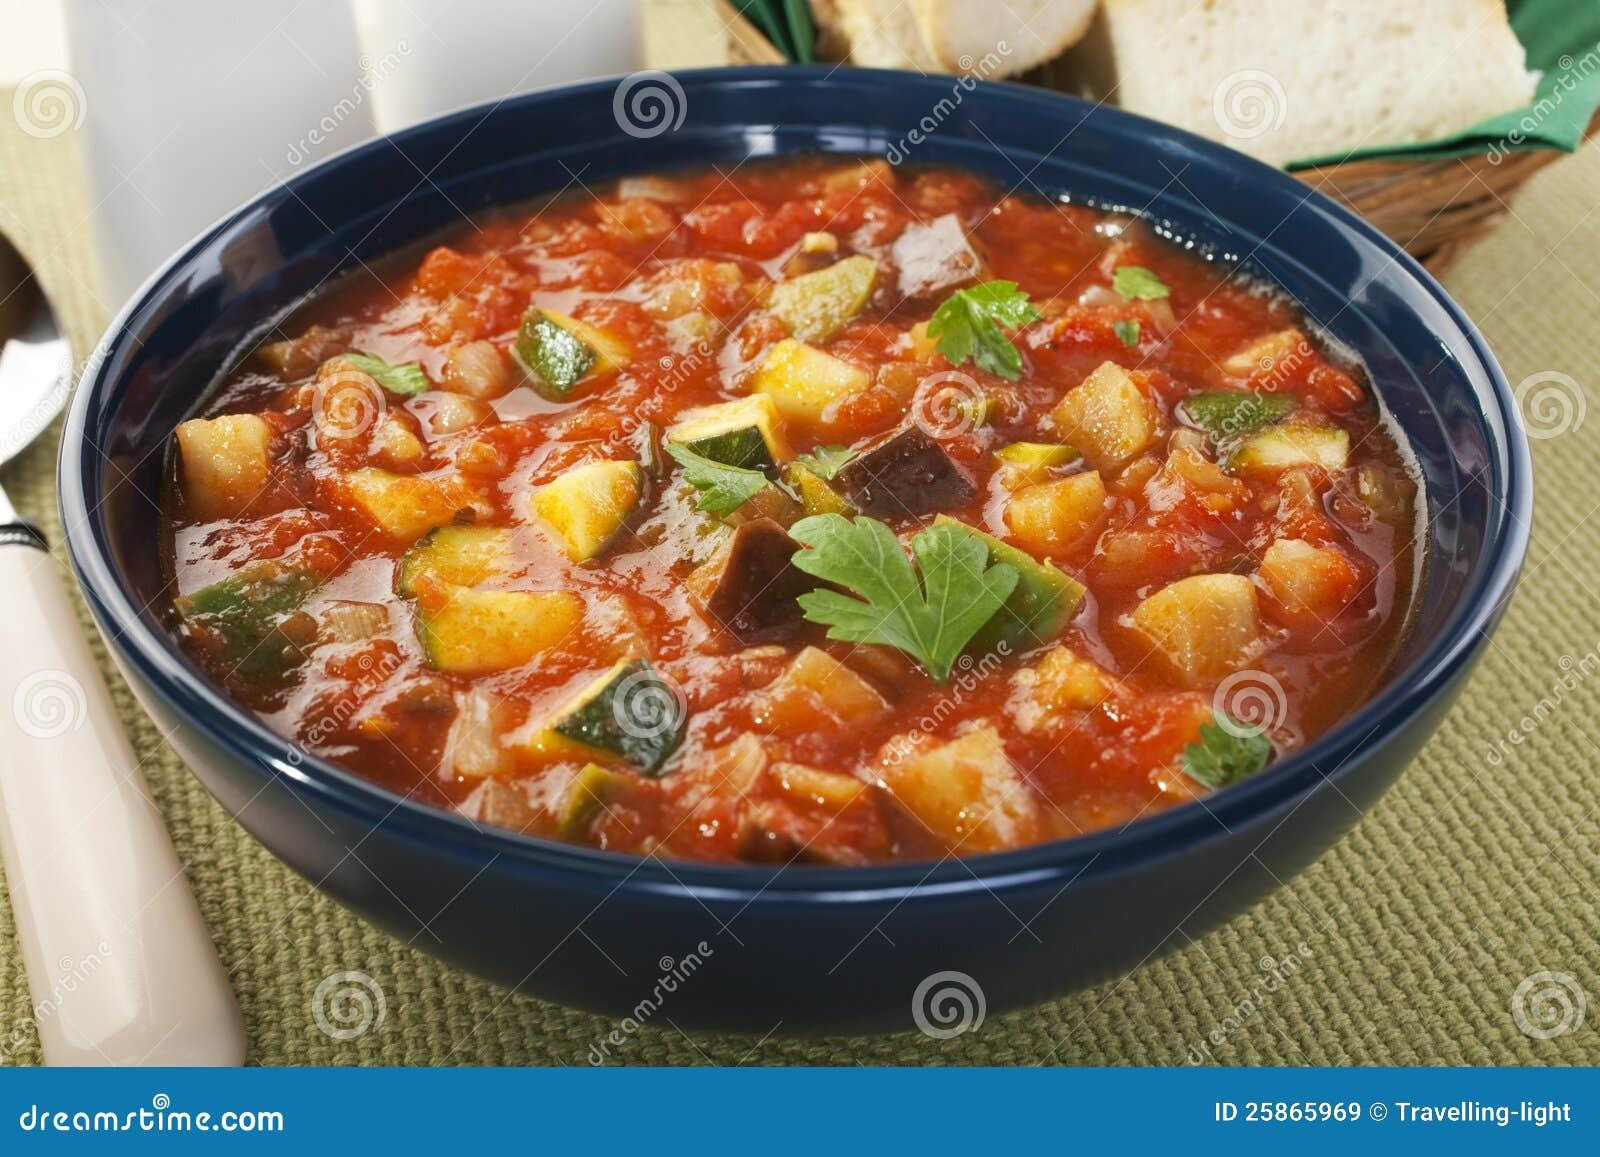 Ratatouille Soup Recipes — Dishmaps